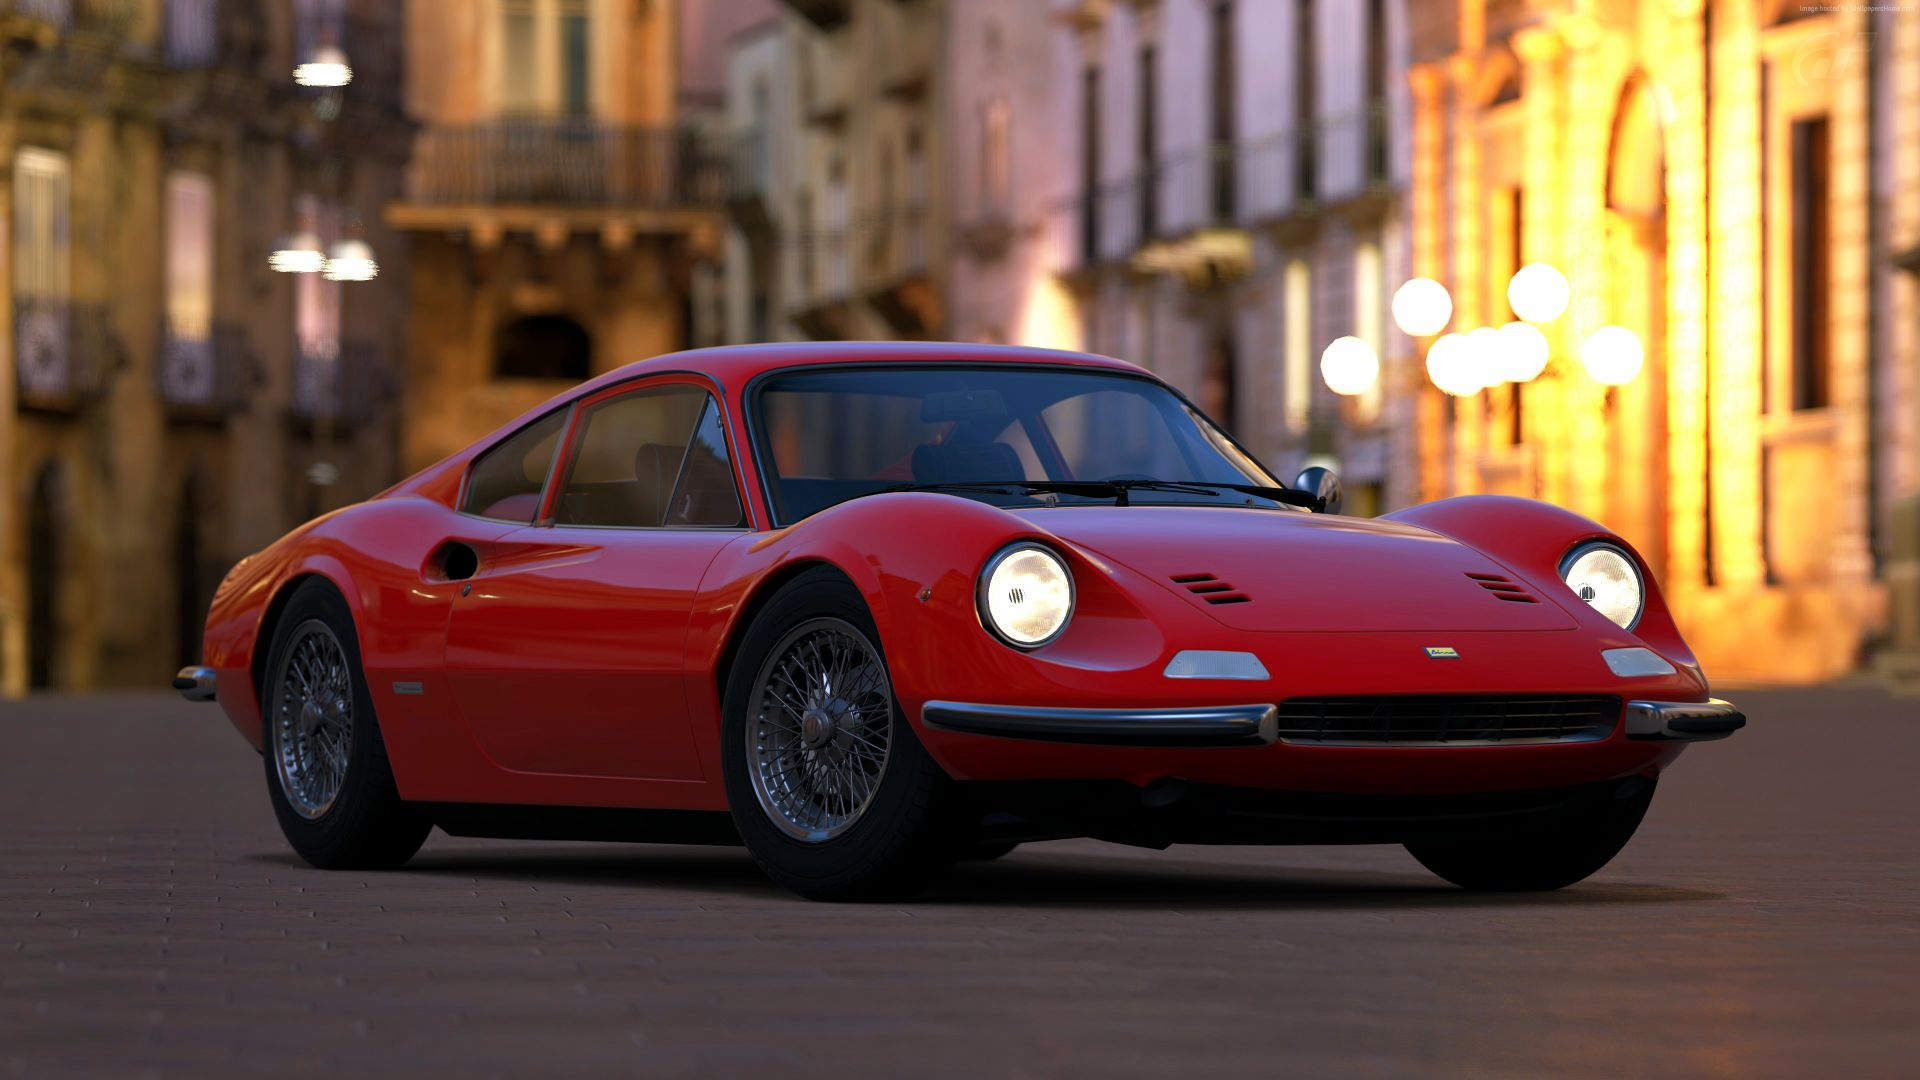 Wallpaper Ferrari Dino, sports car, red, 4k